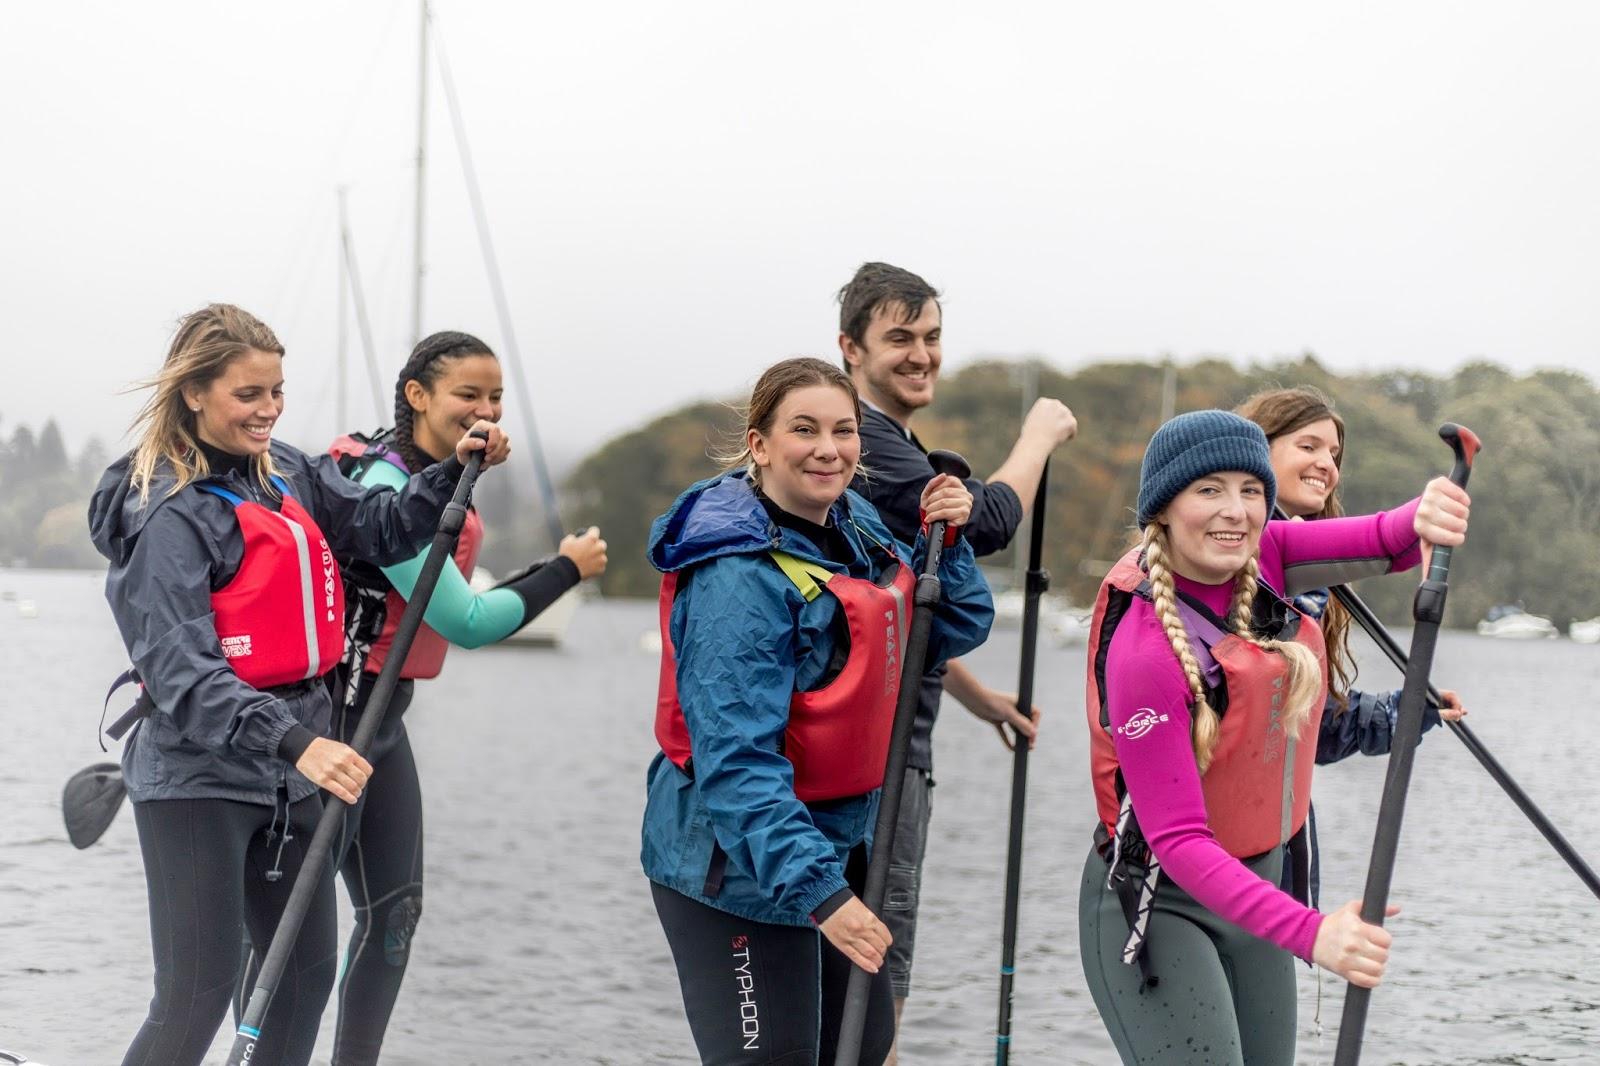 #WMGT, #WMGlobalTravellers, #LakeDistrict, #Ullswater, #Windermere, #Ambleside, #BritishCountryside, #theLifeofaSocialButterfly, #WheresMollie, #tblogger, #TravelBlogger, #GroupTravel, #Adventure, #Weekend, #SoloTravel, #travel, #VisitEngland, #England, #Cumbria, #Scenic, #GreatBritain, #YHA, #Hostel, #YHAAmbleside